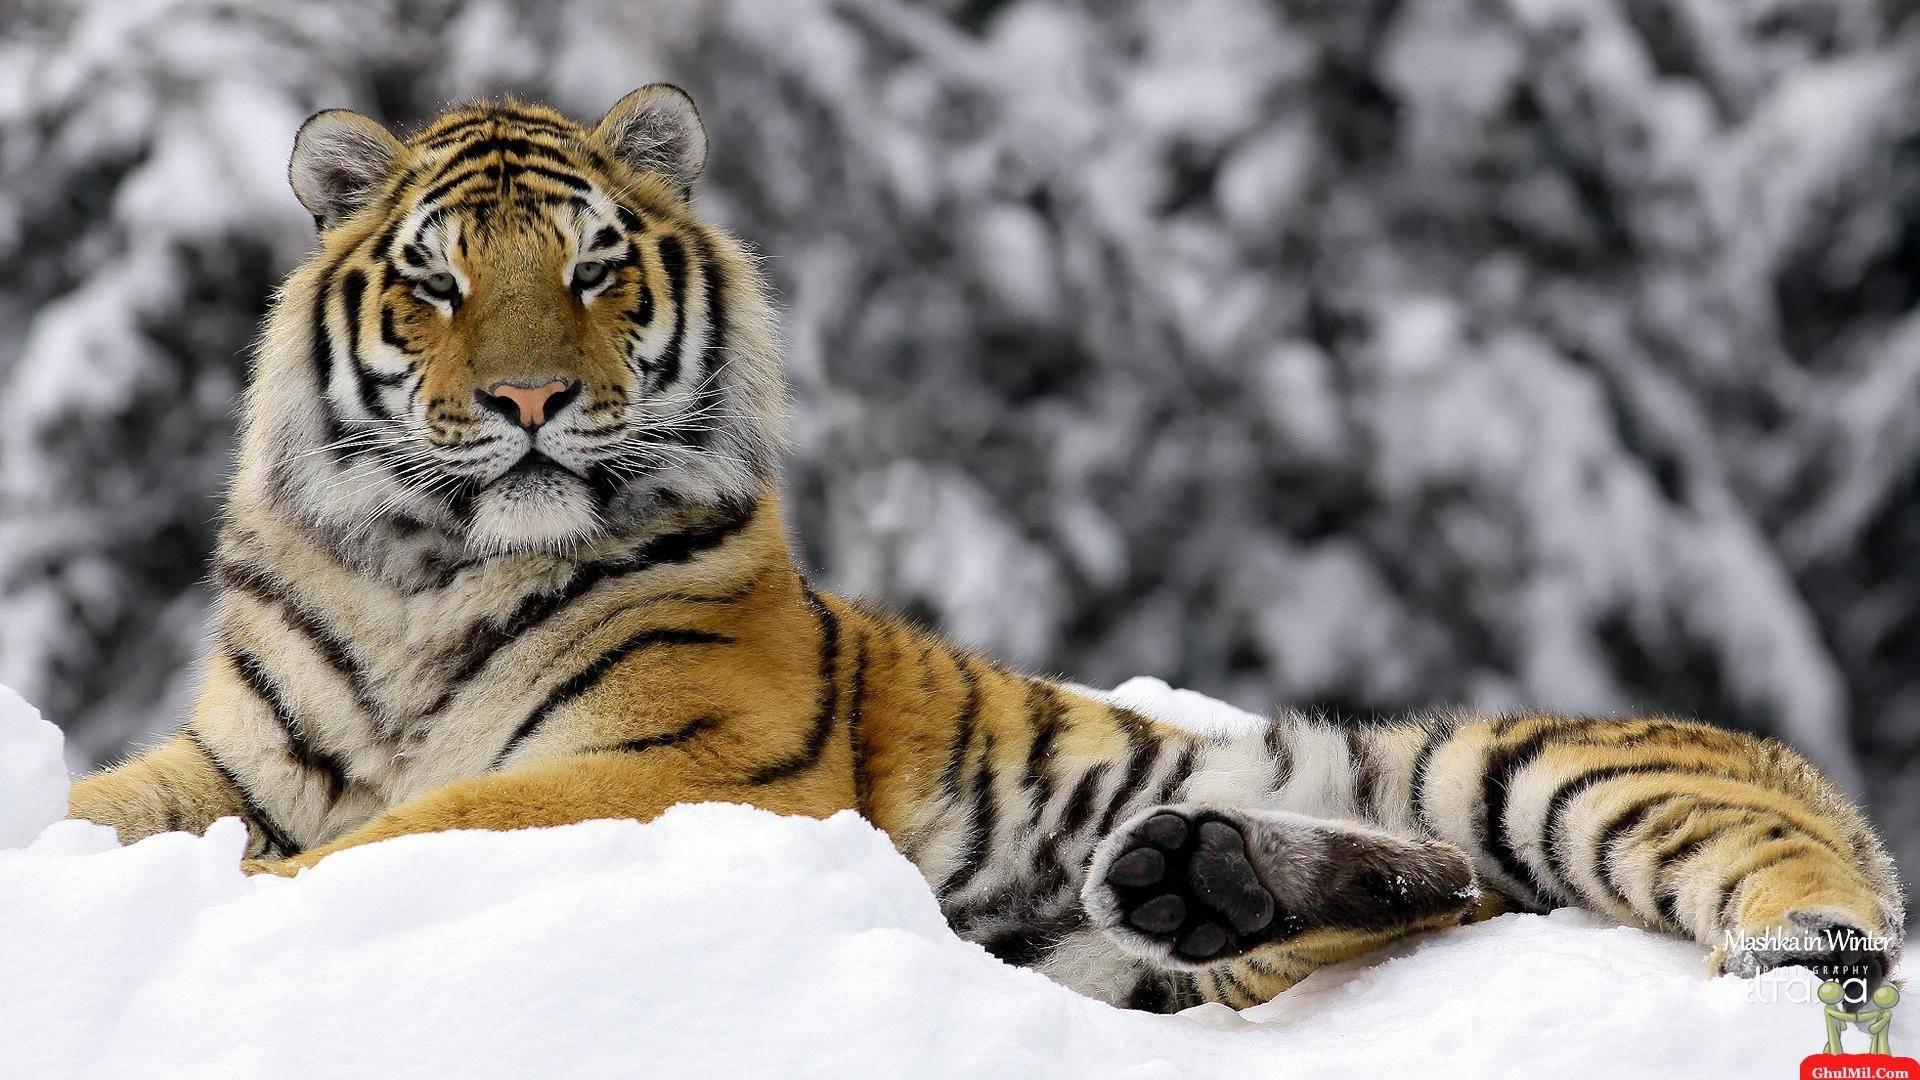 Siberian Tiger Wallpapers   Top Siberian Tiger Backgrounds 1920x1080